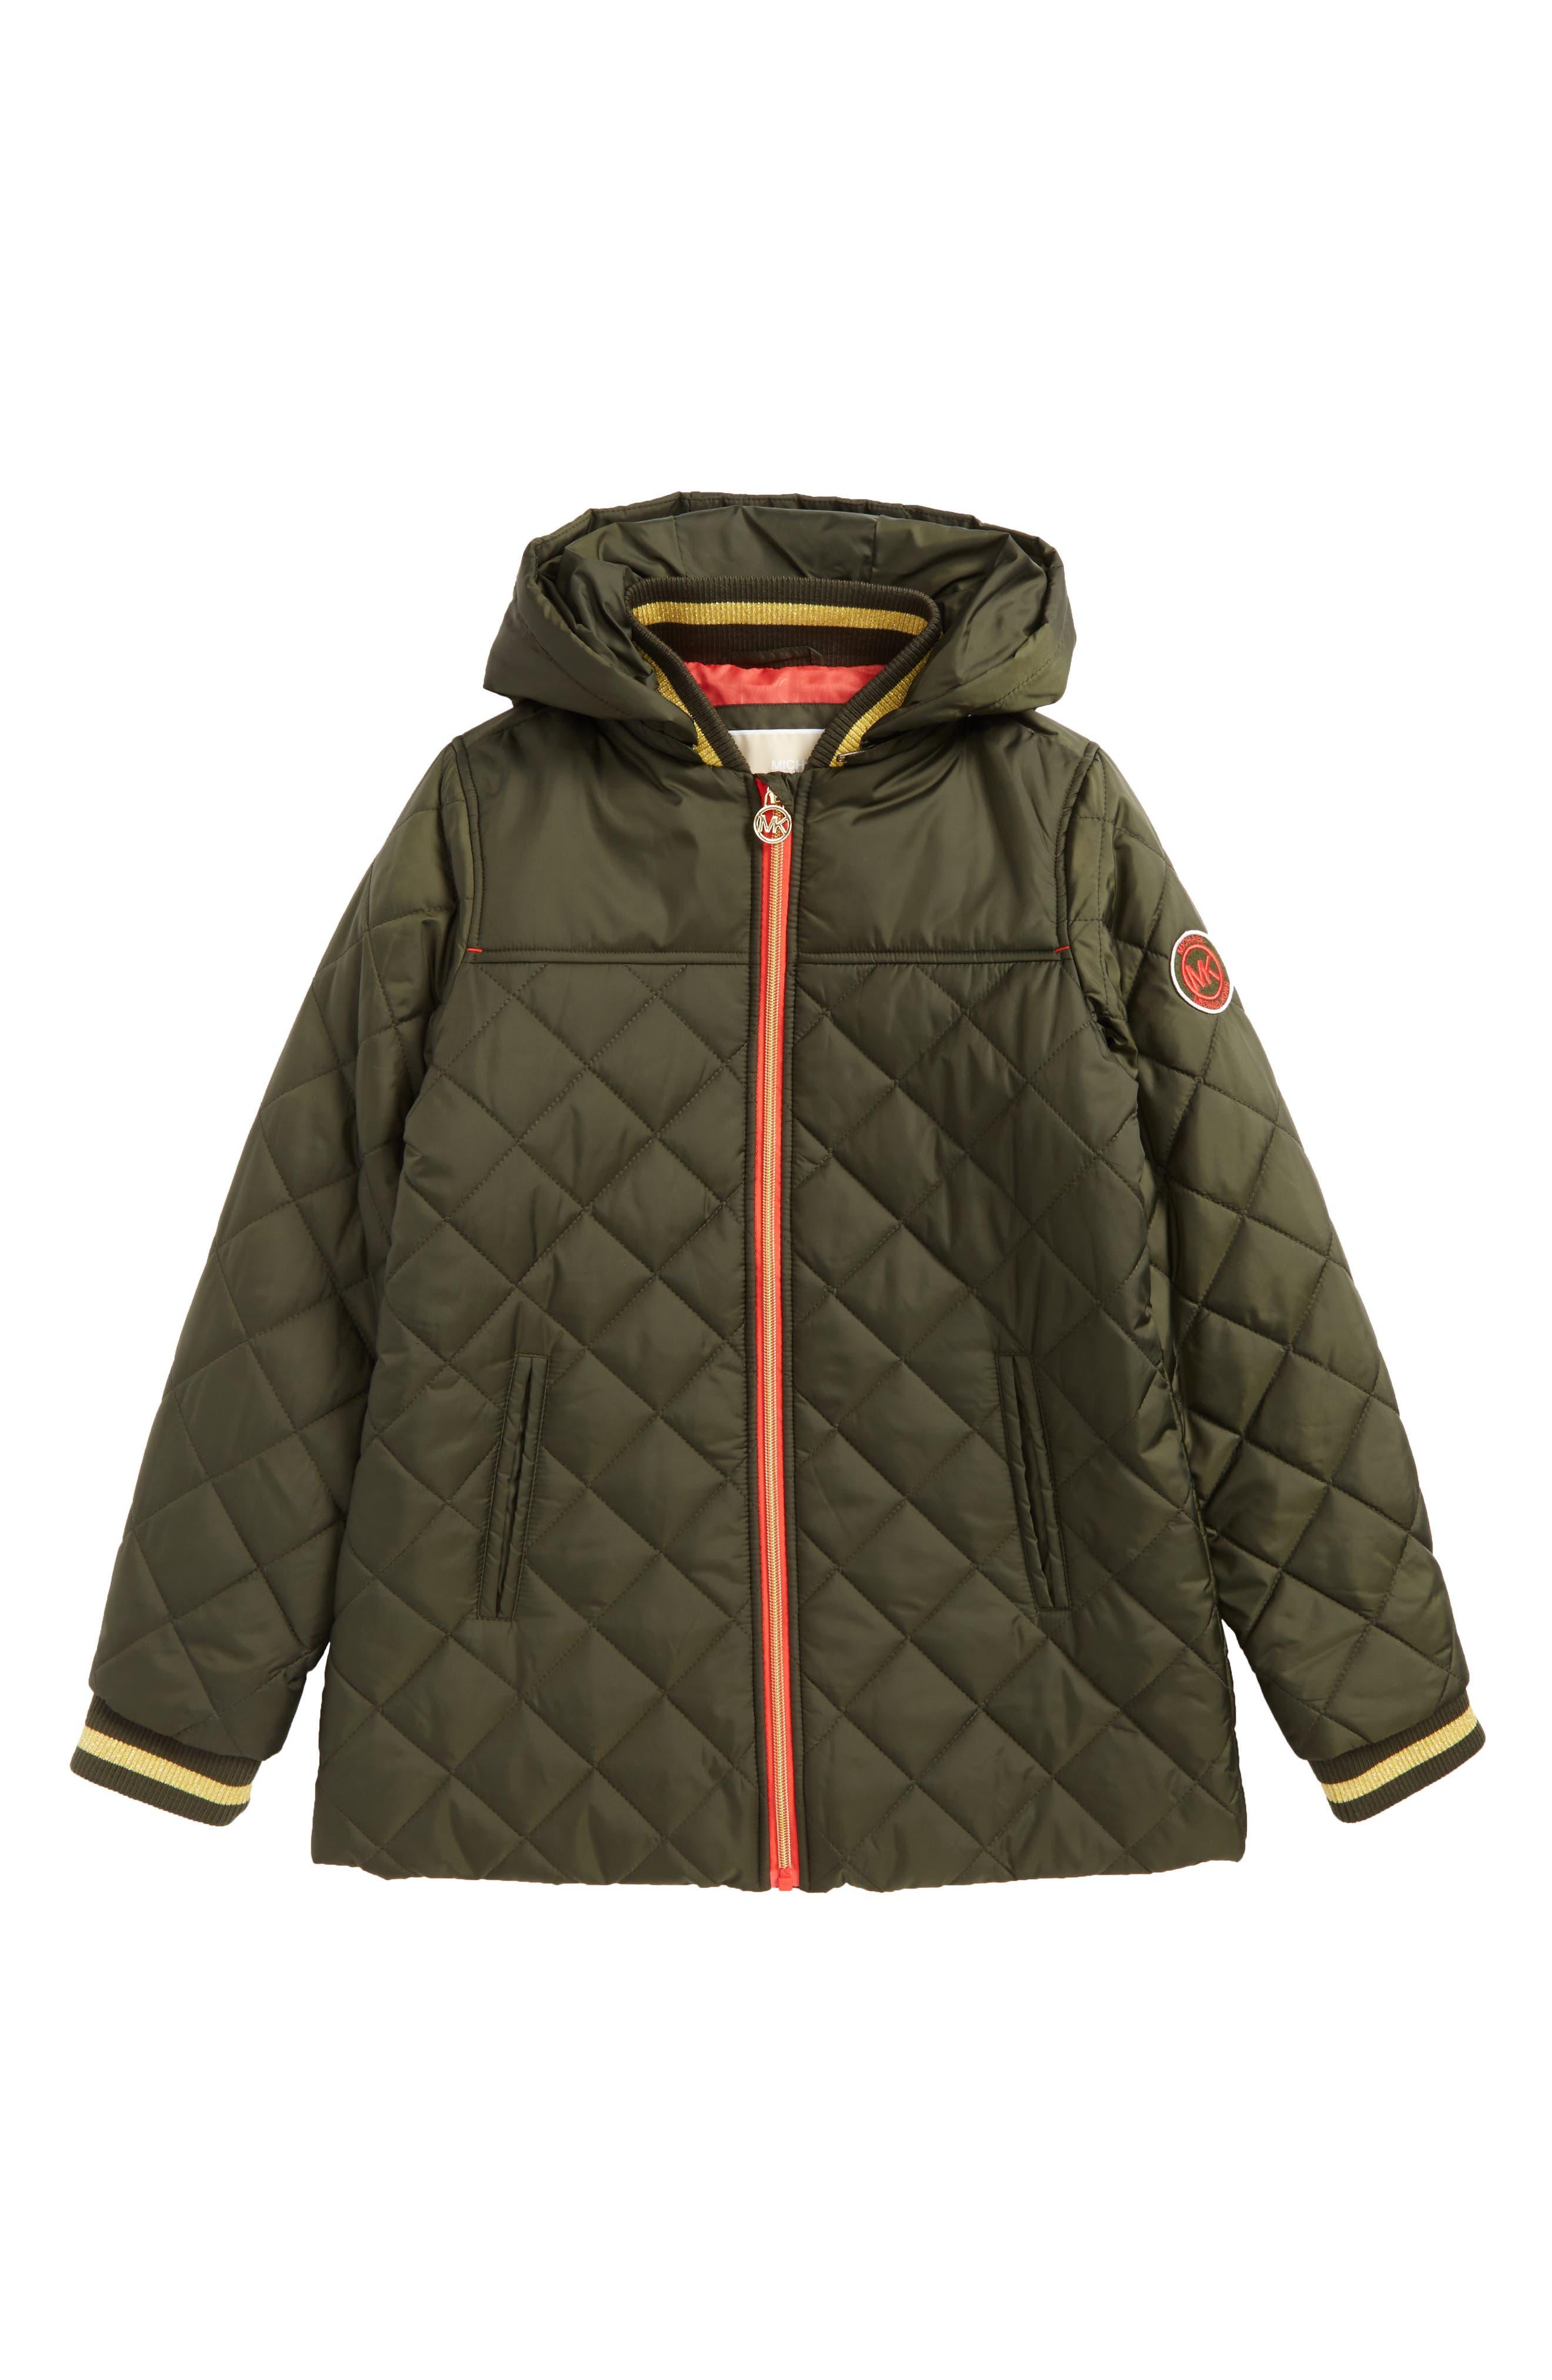 Alternate Image 1 Selected - Michael Kors Quilted Hooded Jacket (Big Girls)